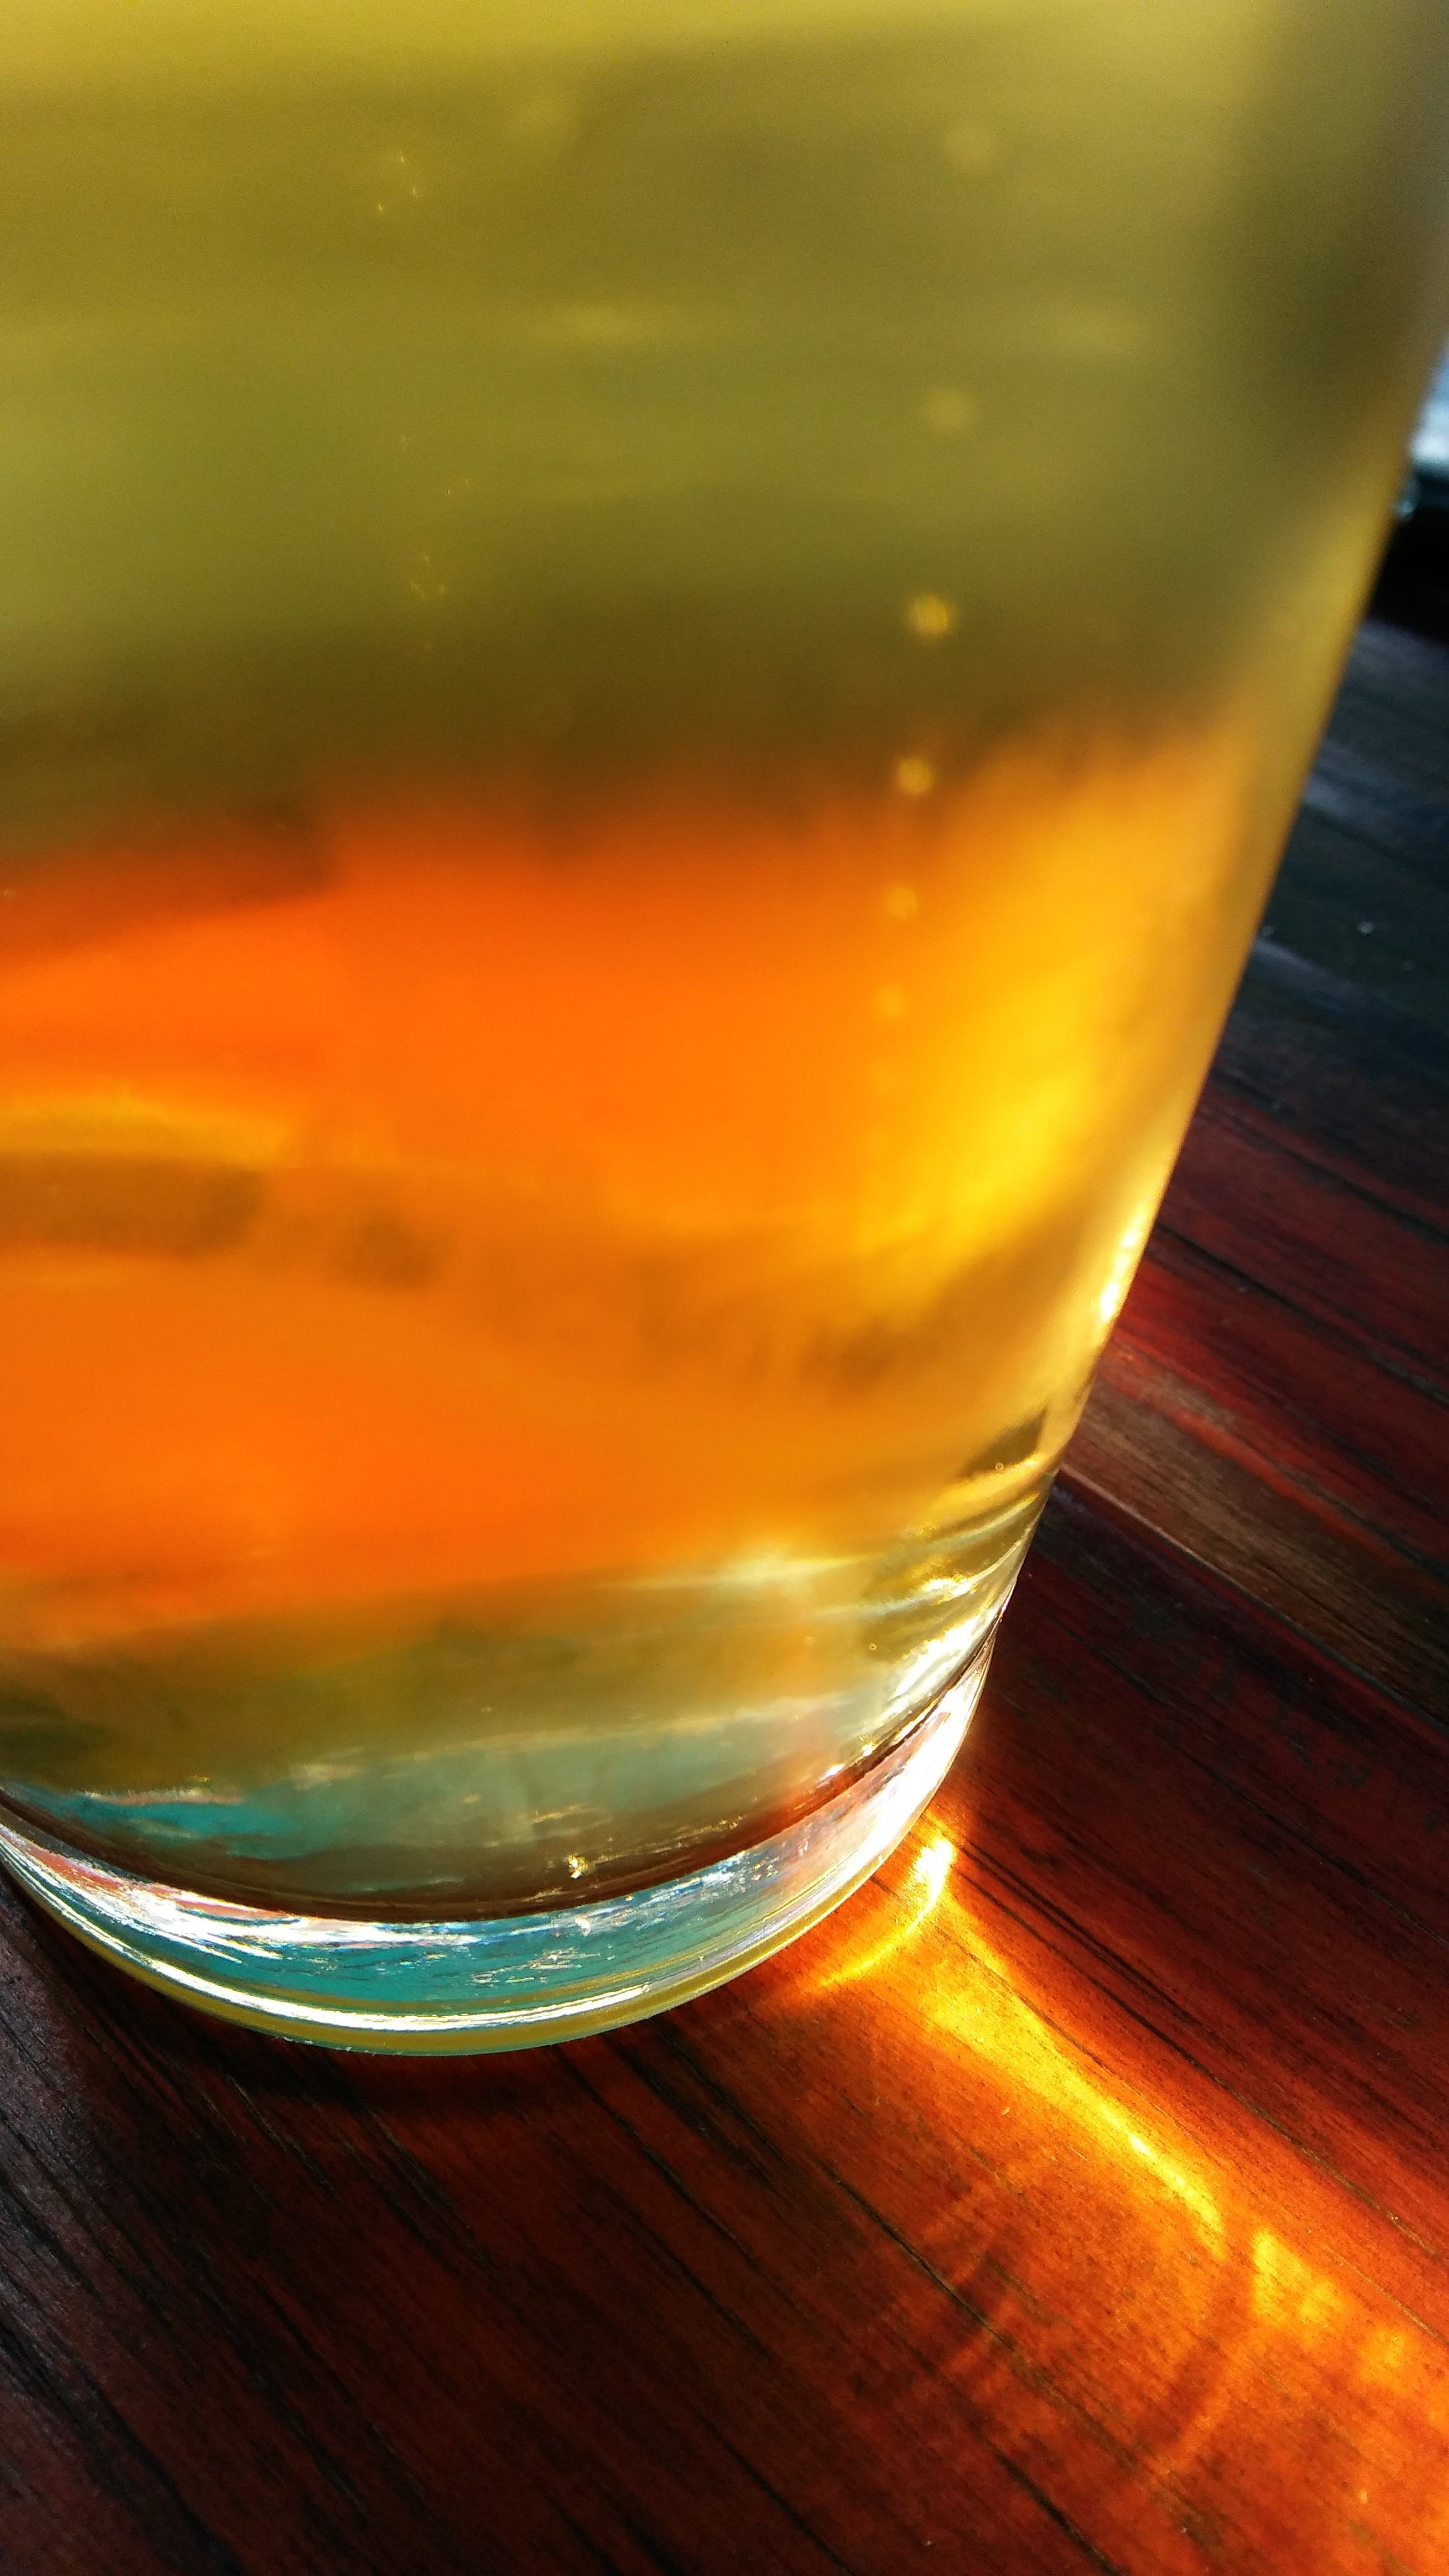 alcoholic beverage, beer, beverage